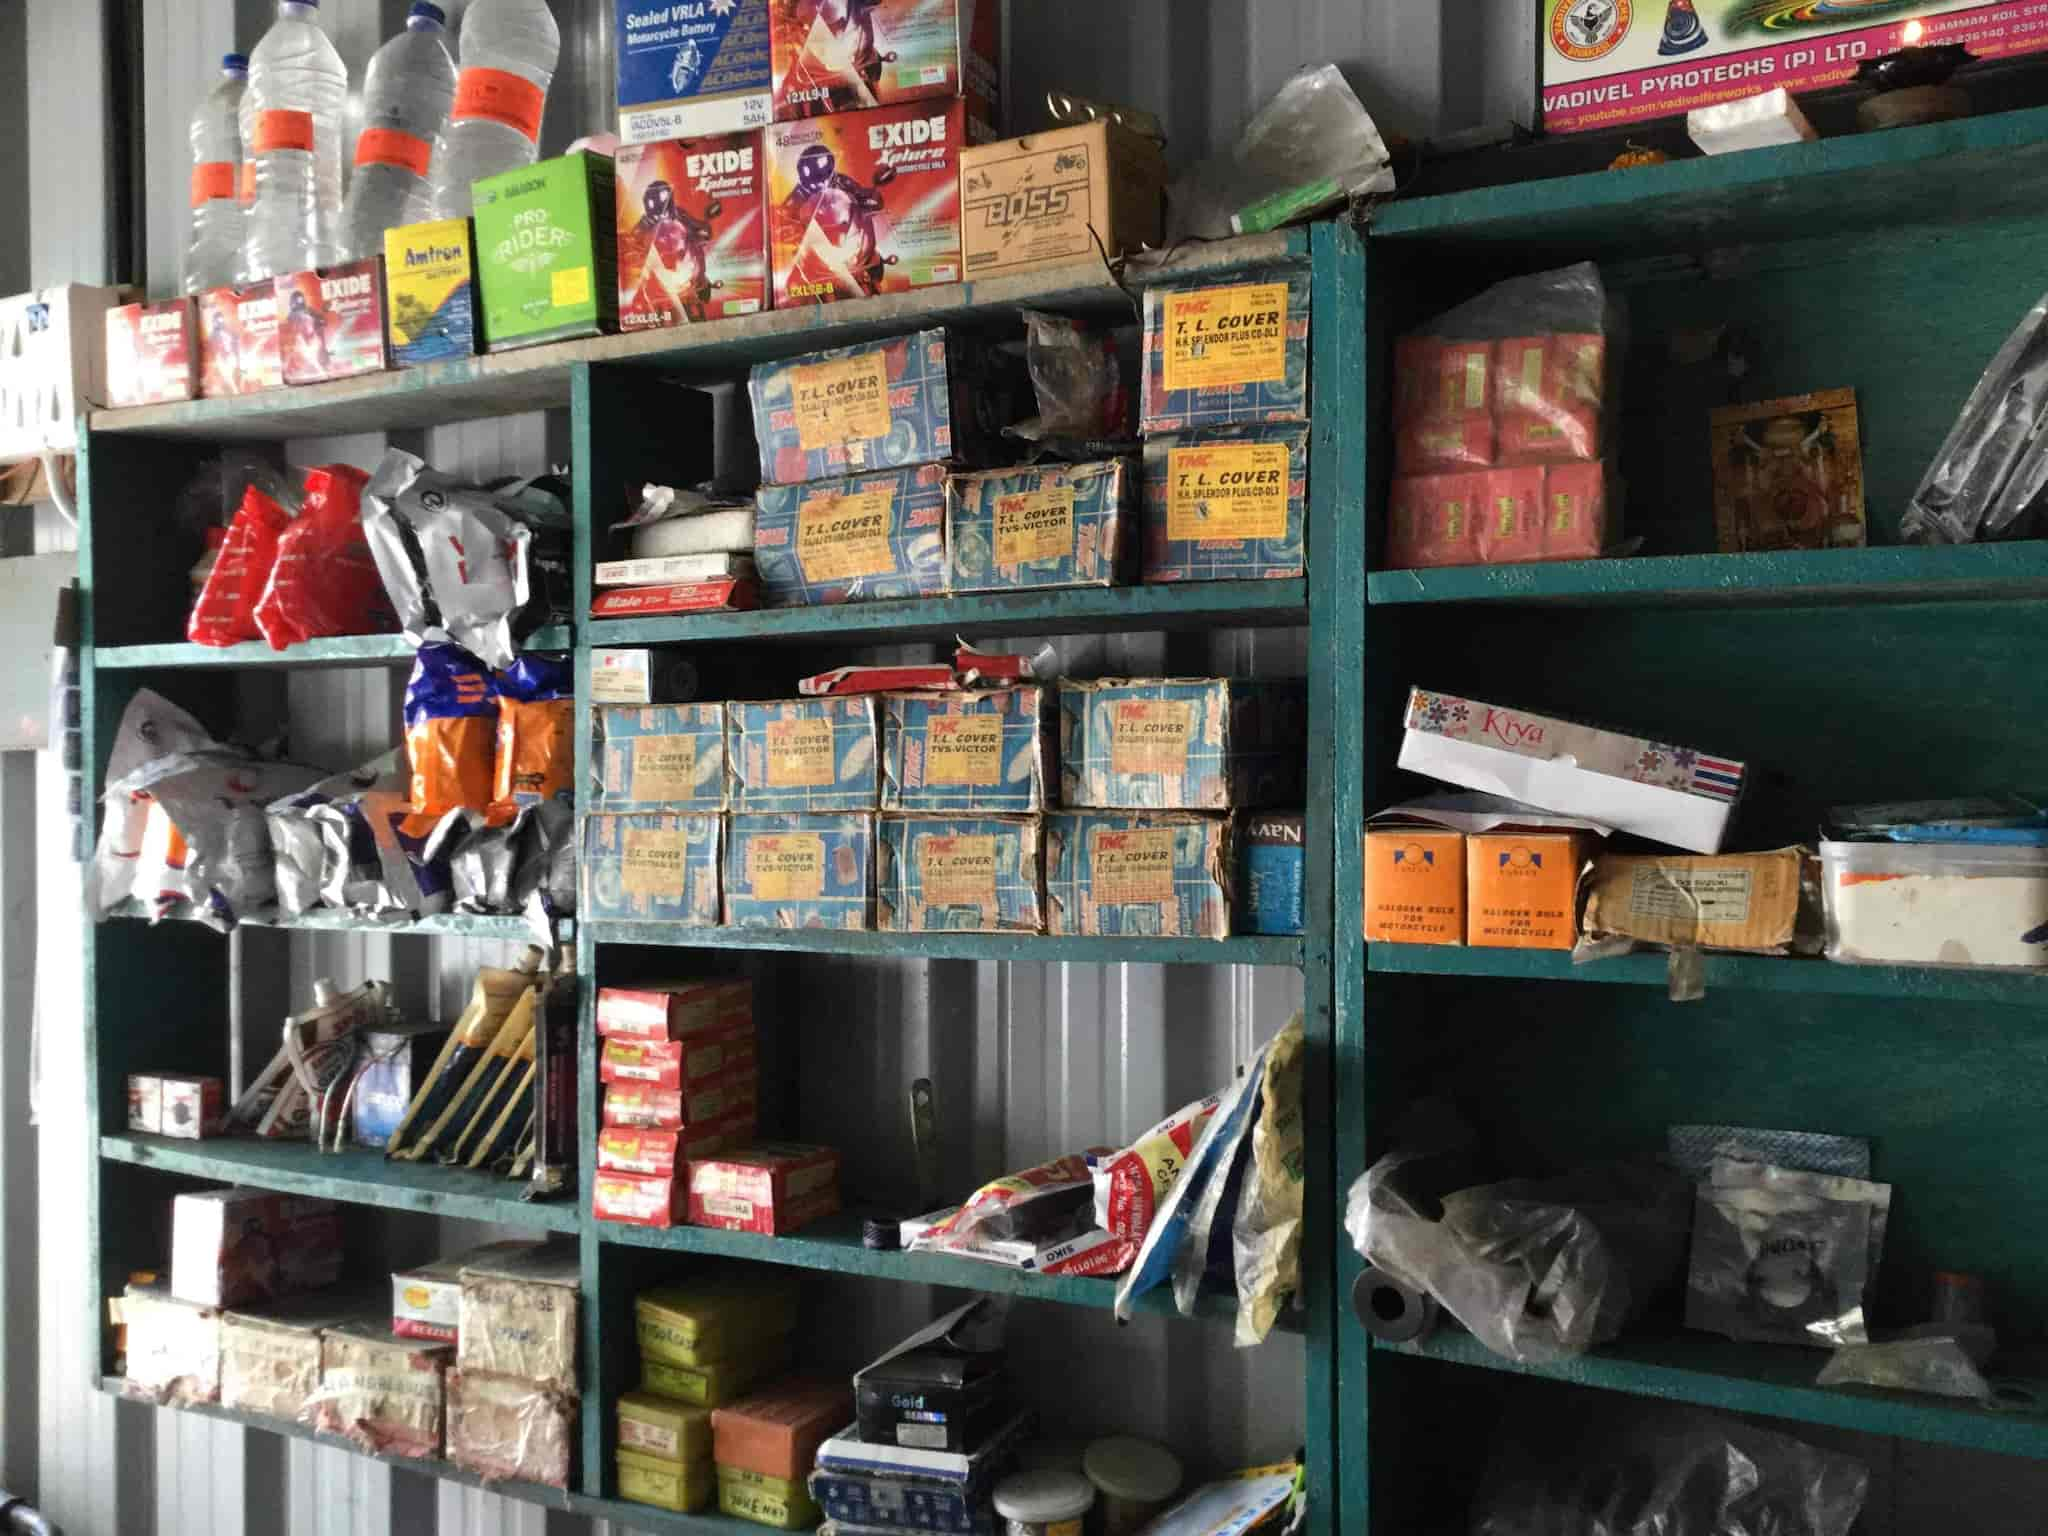 Ramdevbaba Autombiles, Anand Nagar Chowk - Garages in Nanded